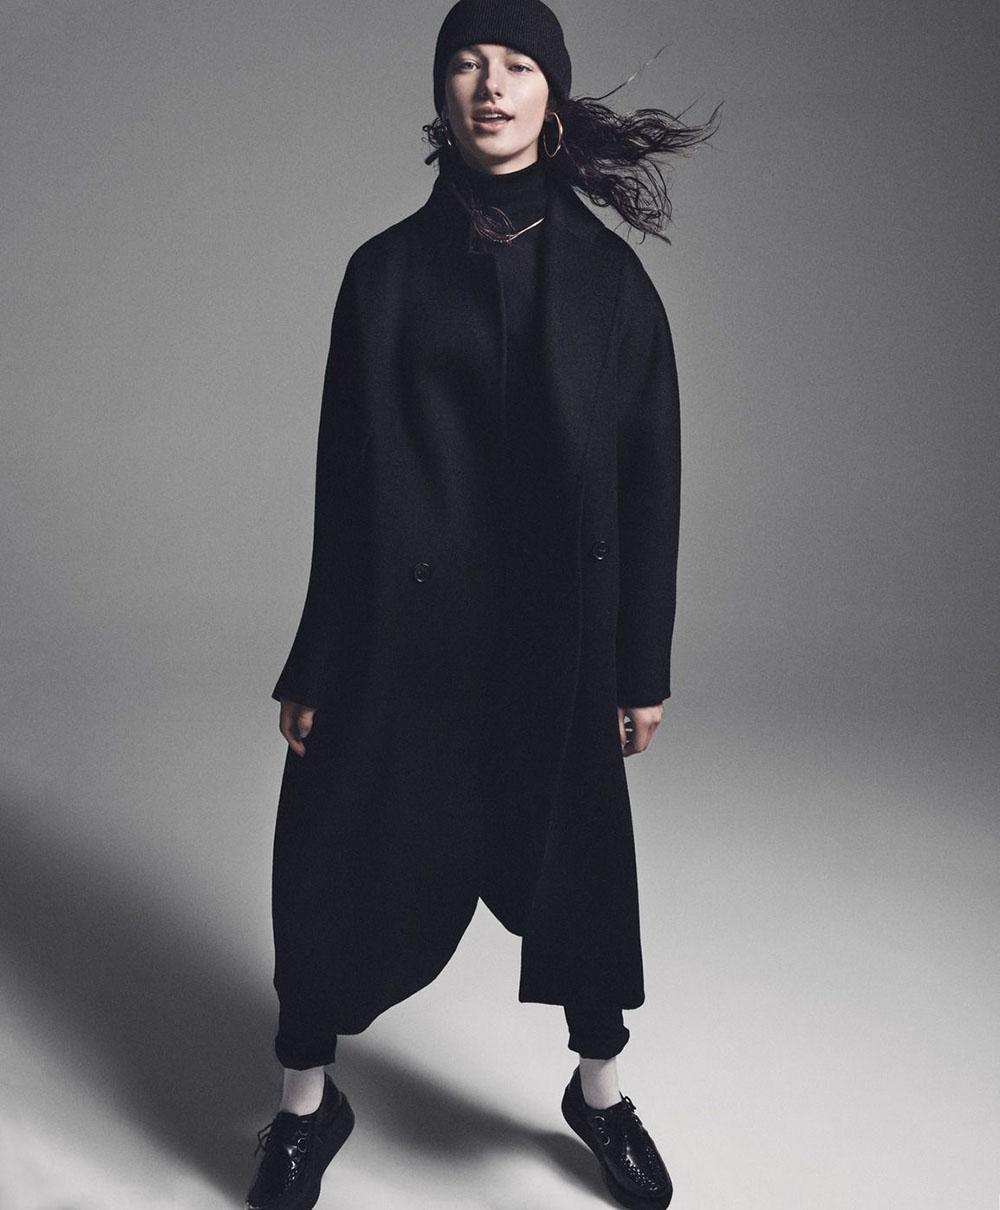 McKenna Hellam by Tom Schirmacher for Elle US January 2019